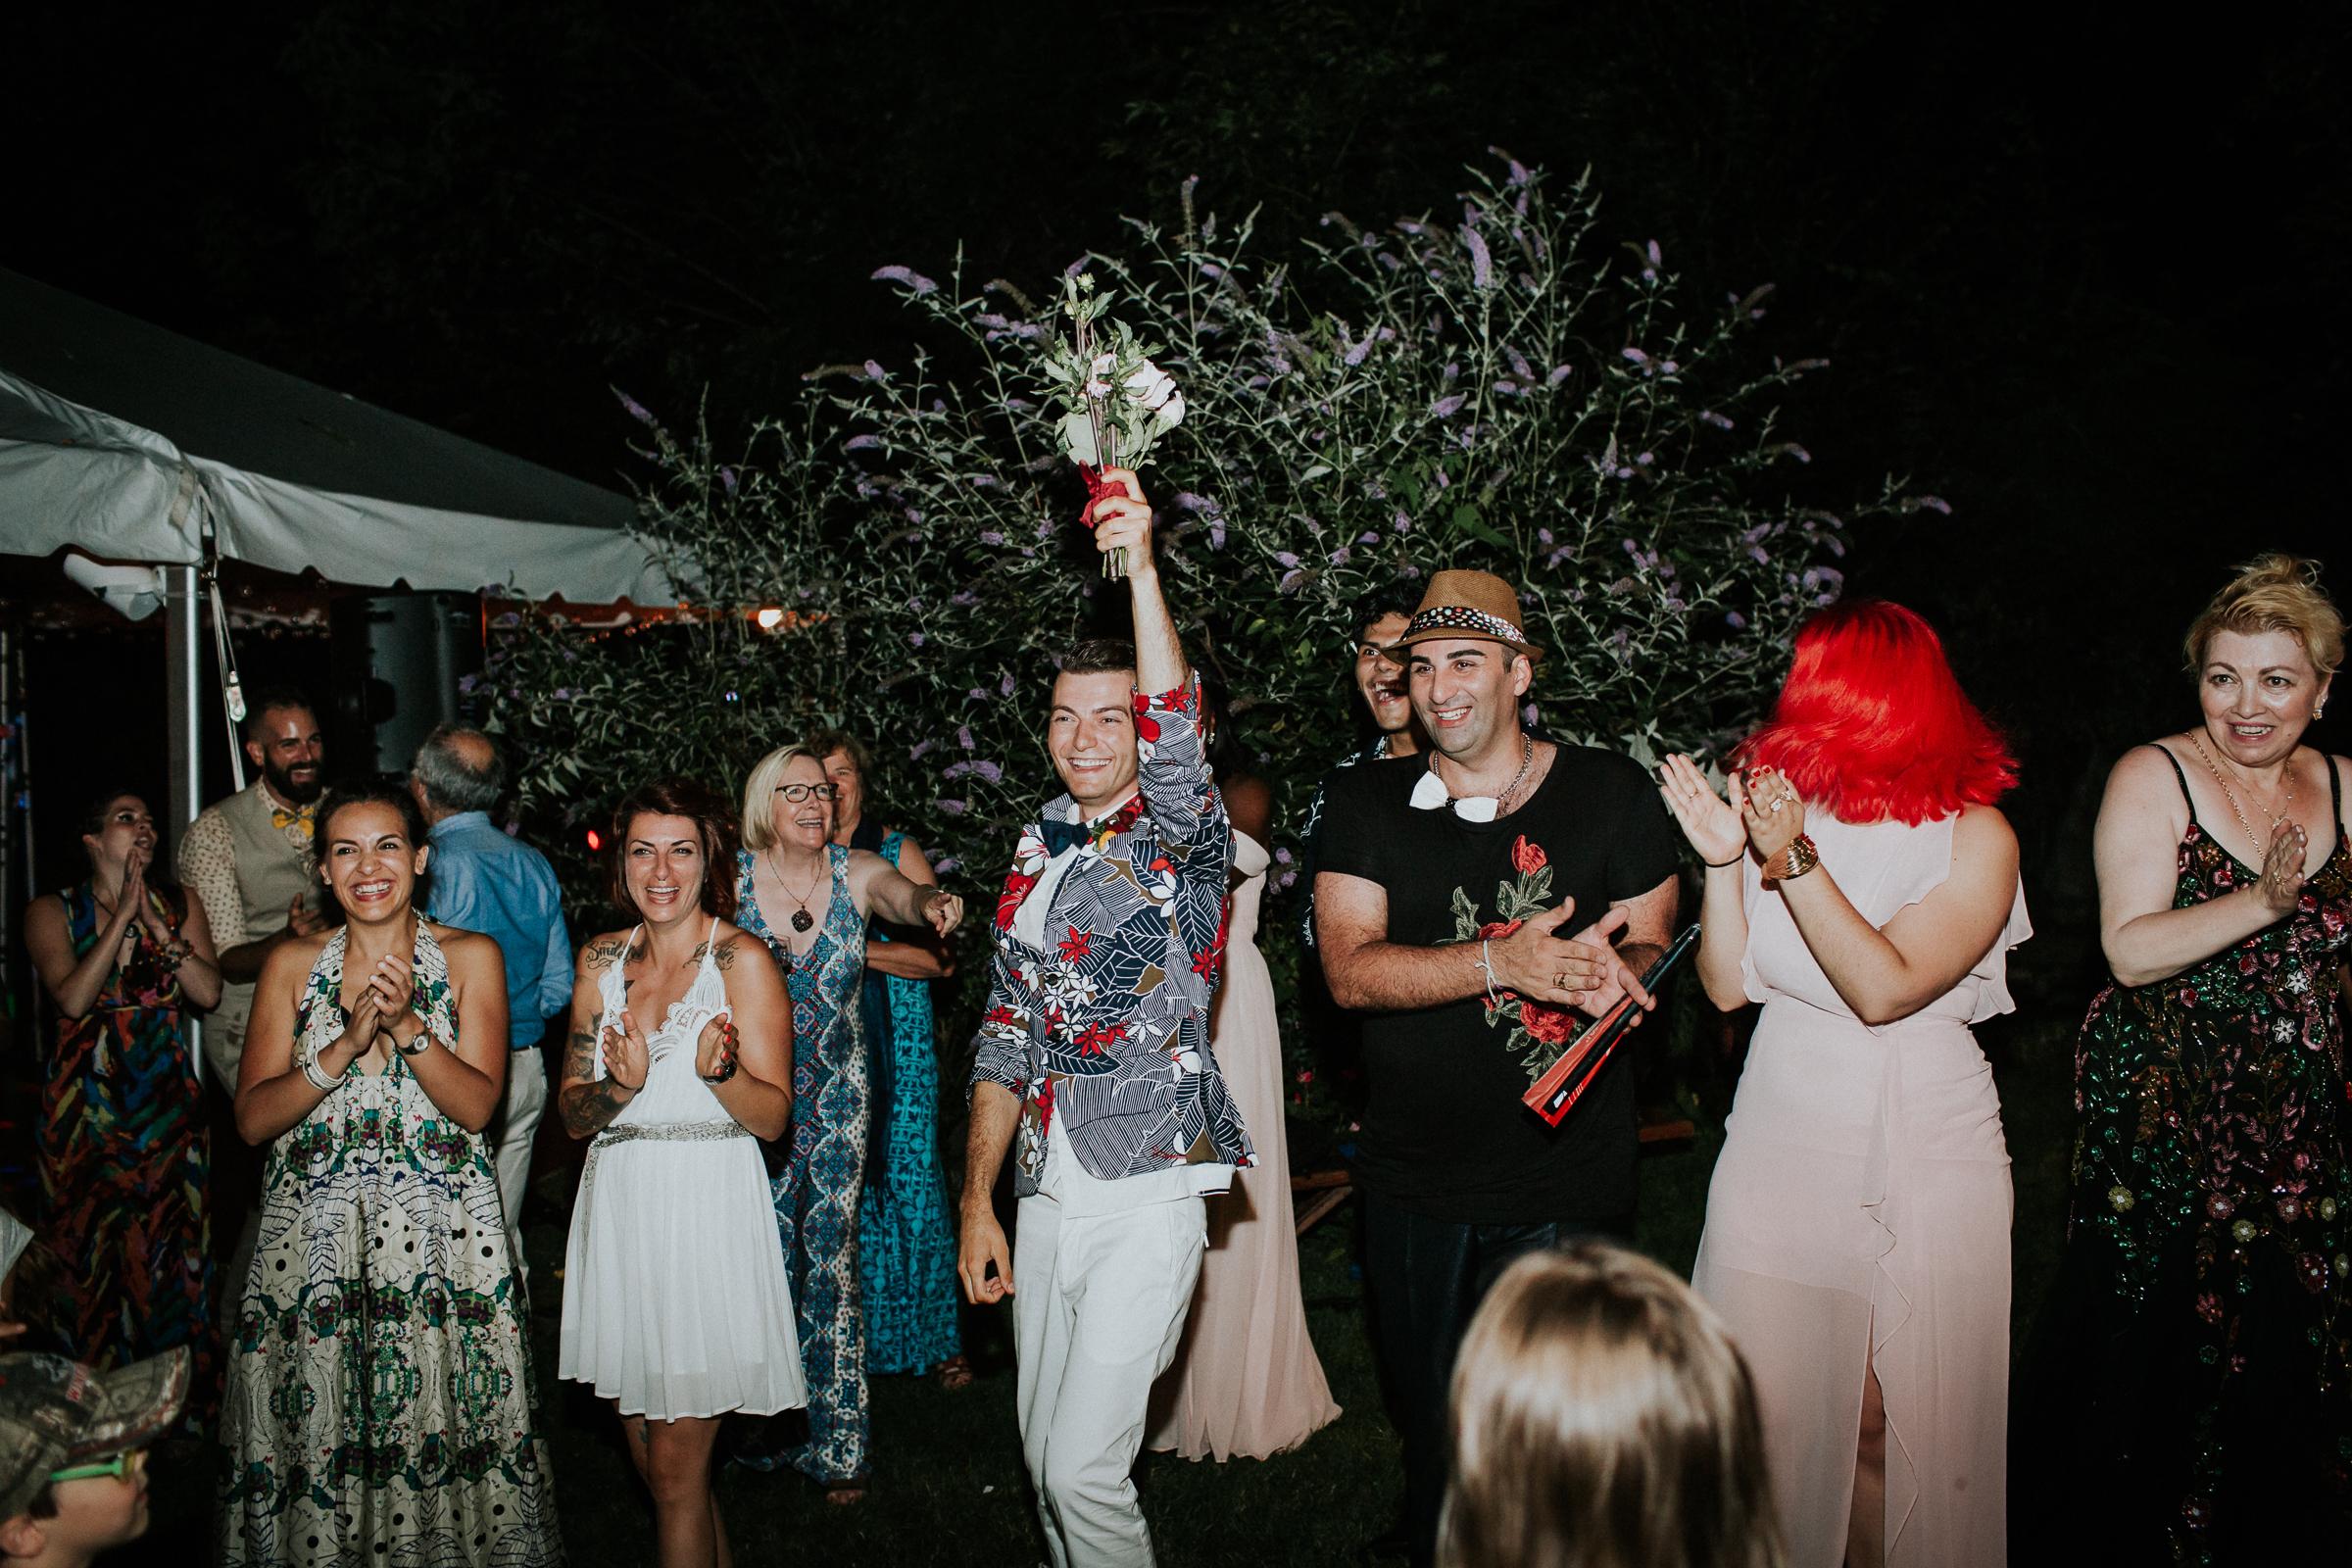 Backyard-Intimate-Adventurous-Destination-Wedding-Darien-Connecticut-Documentary-Wedding-Photography-139.jpg